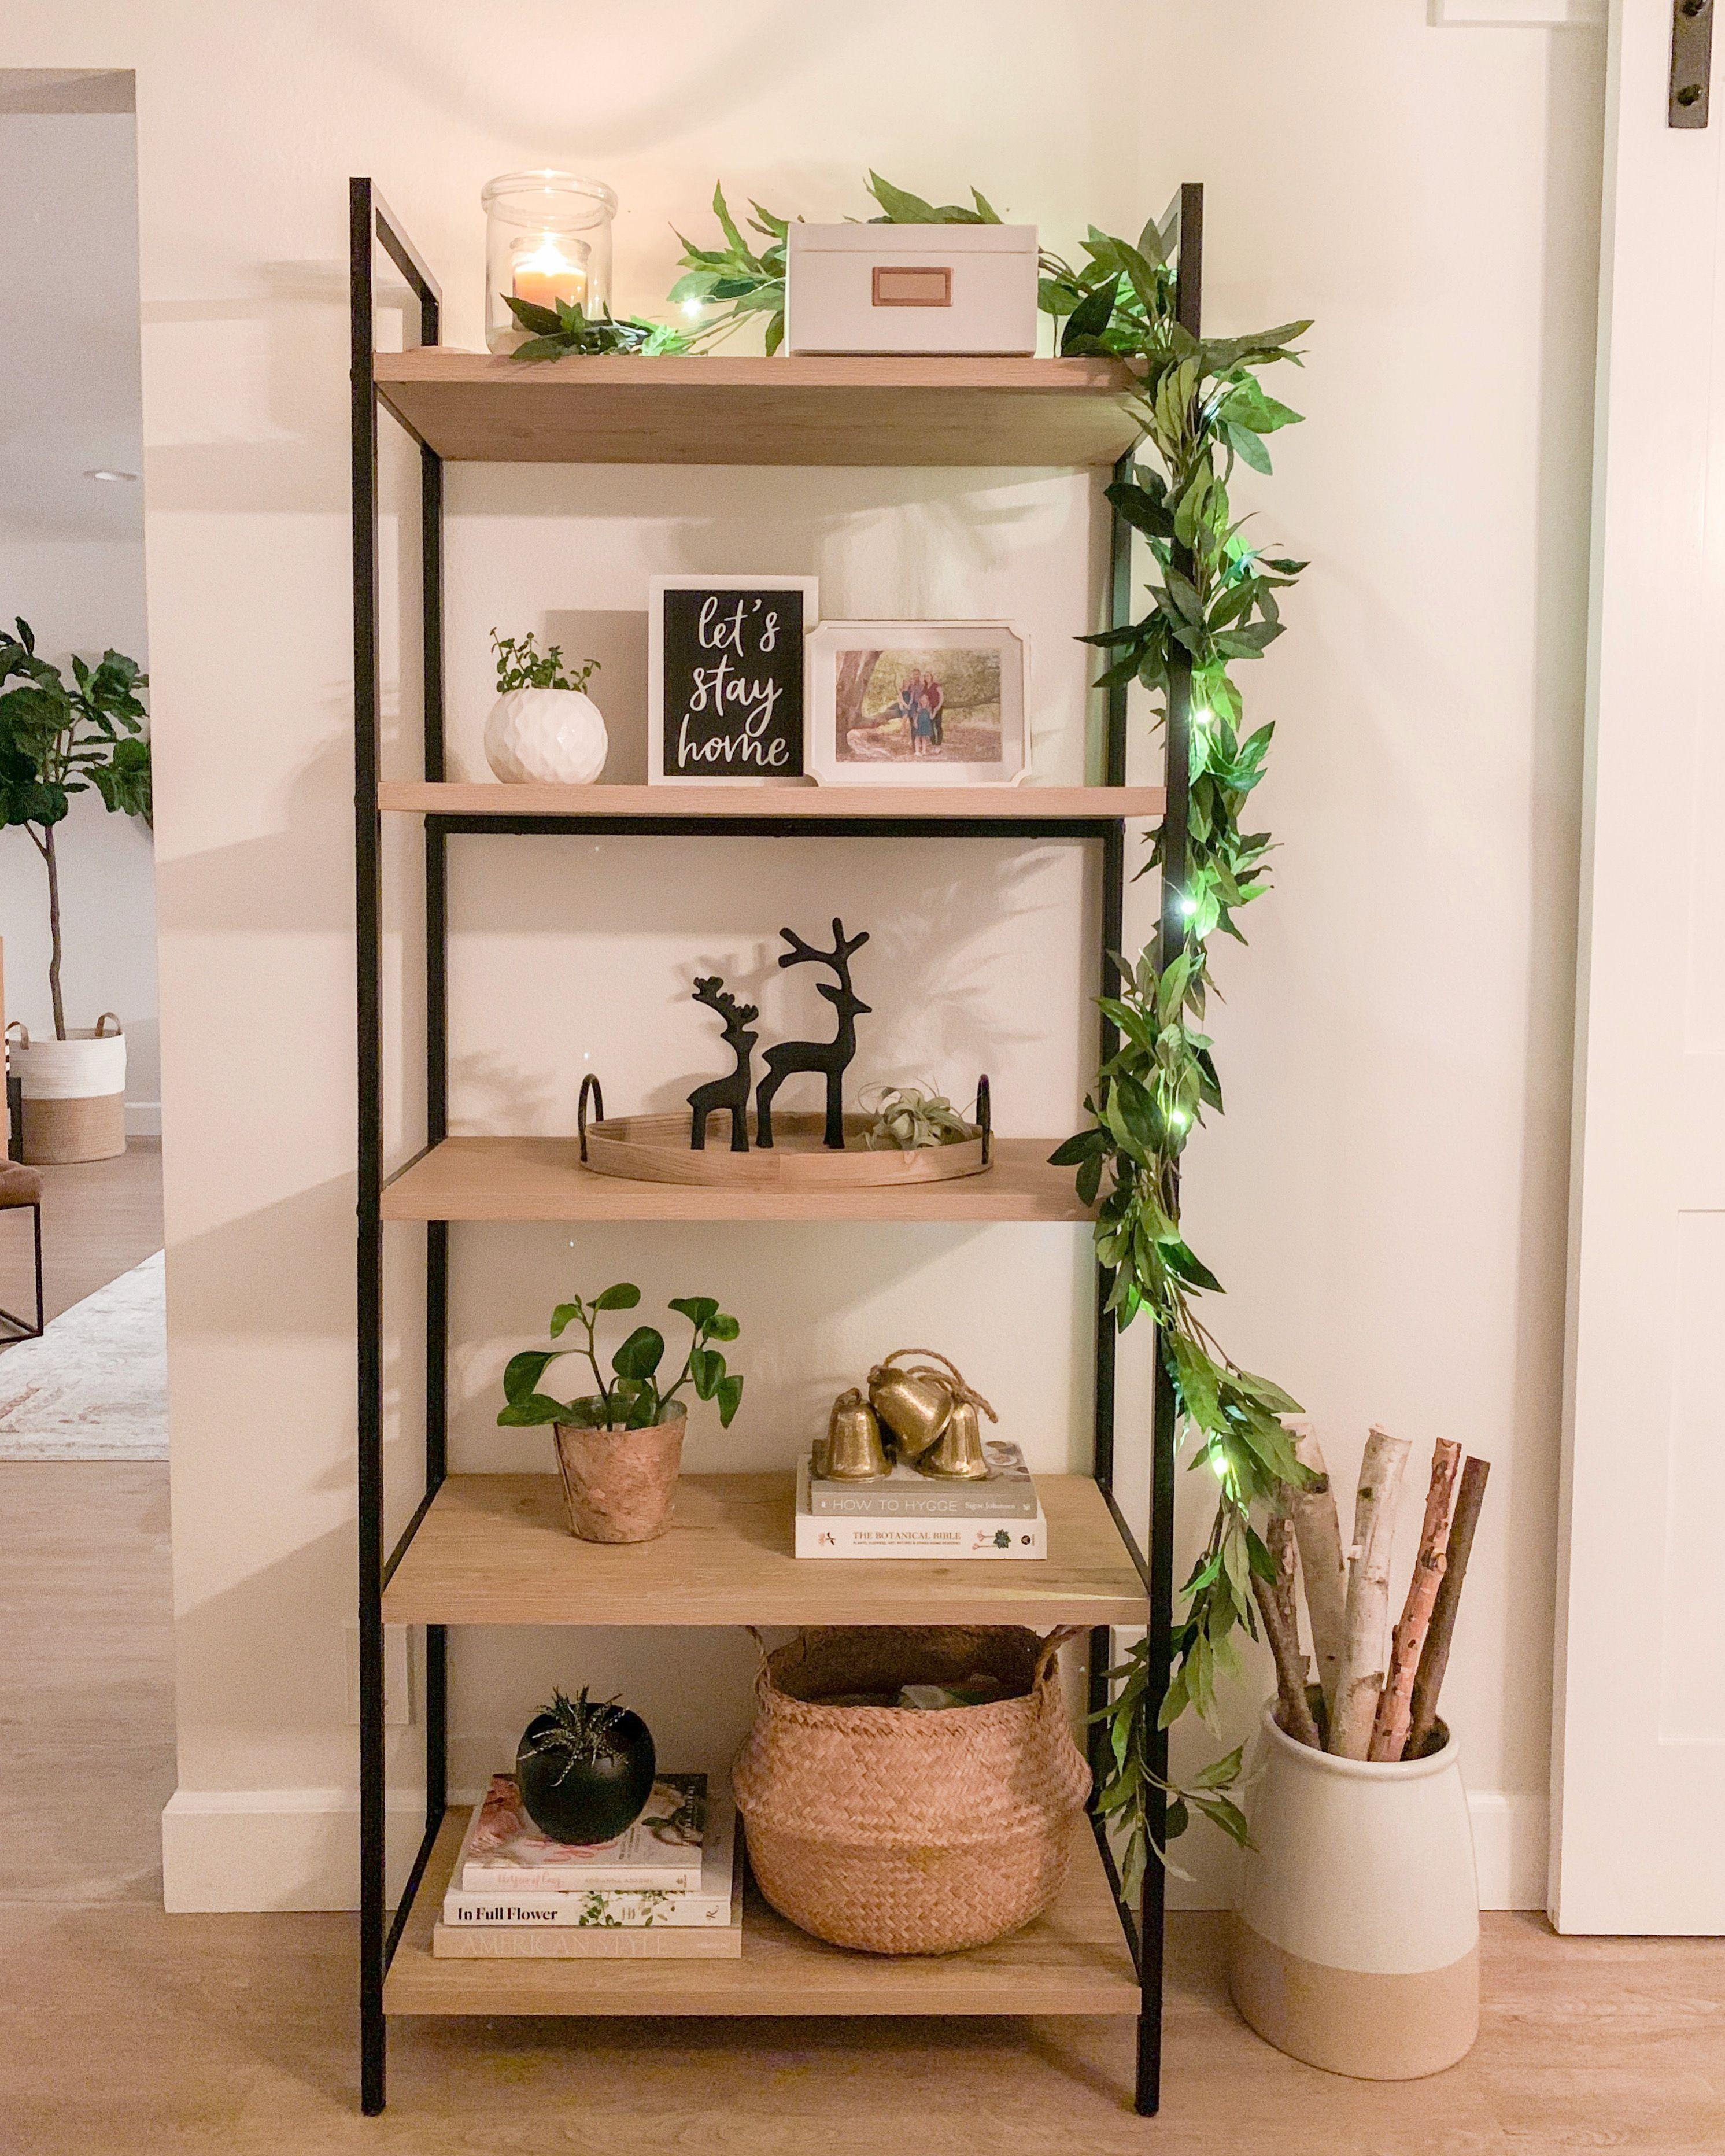 Bookshelf Bookshelf Decor Christmas Decorated Farmhouse Holidays Modern In 2020 Shelf Decor Living Room Bookshelves In Living Room Diy Apartment Decor